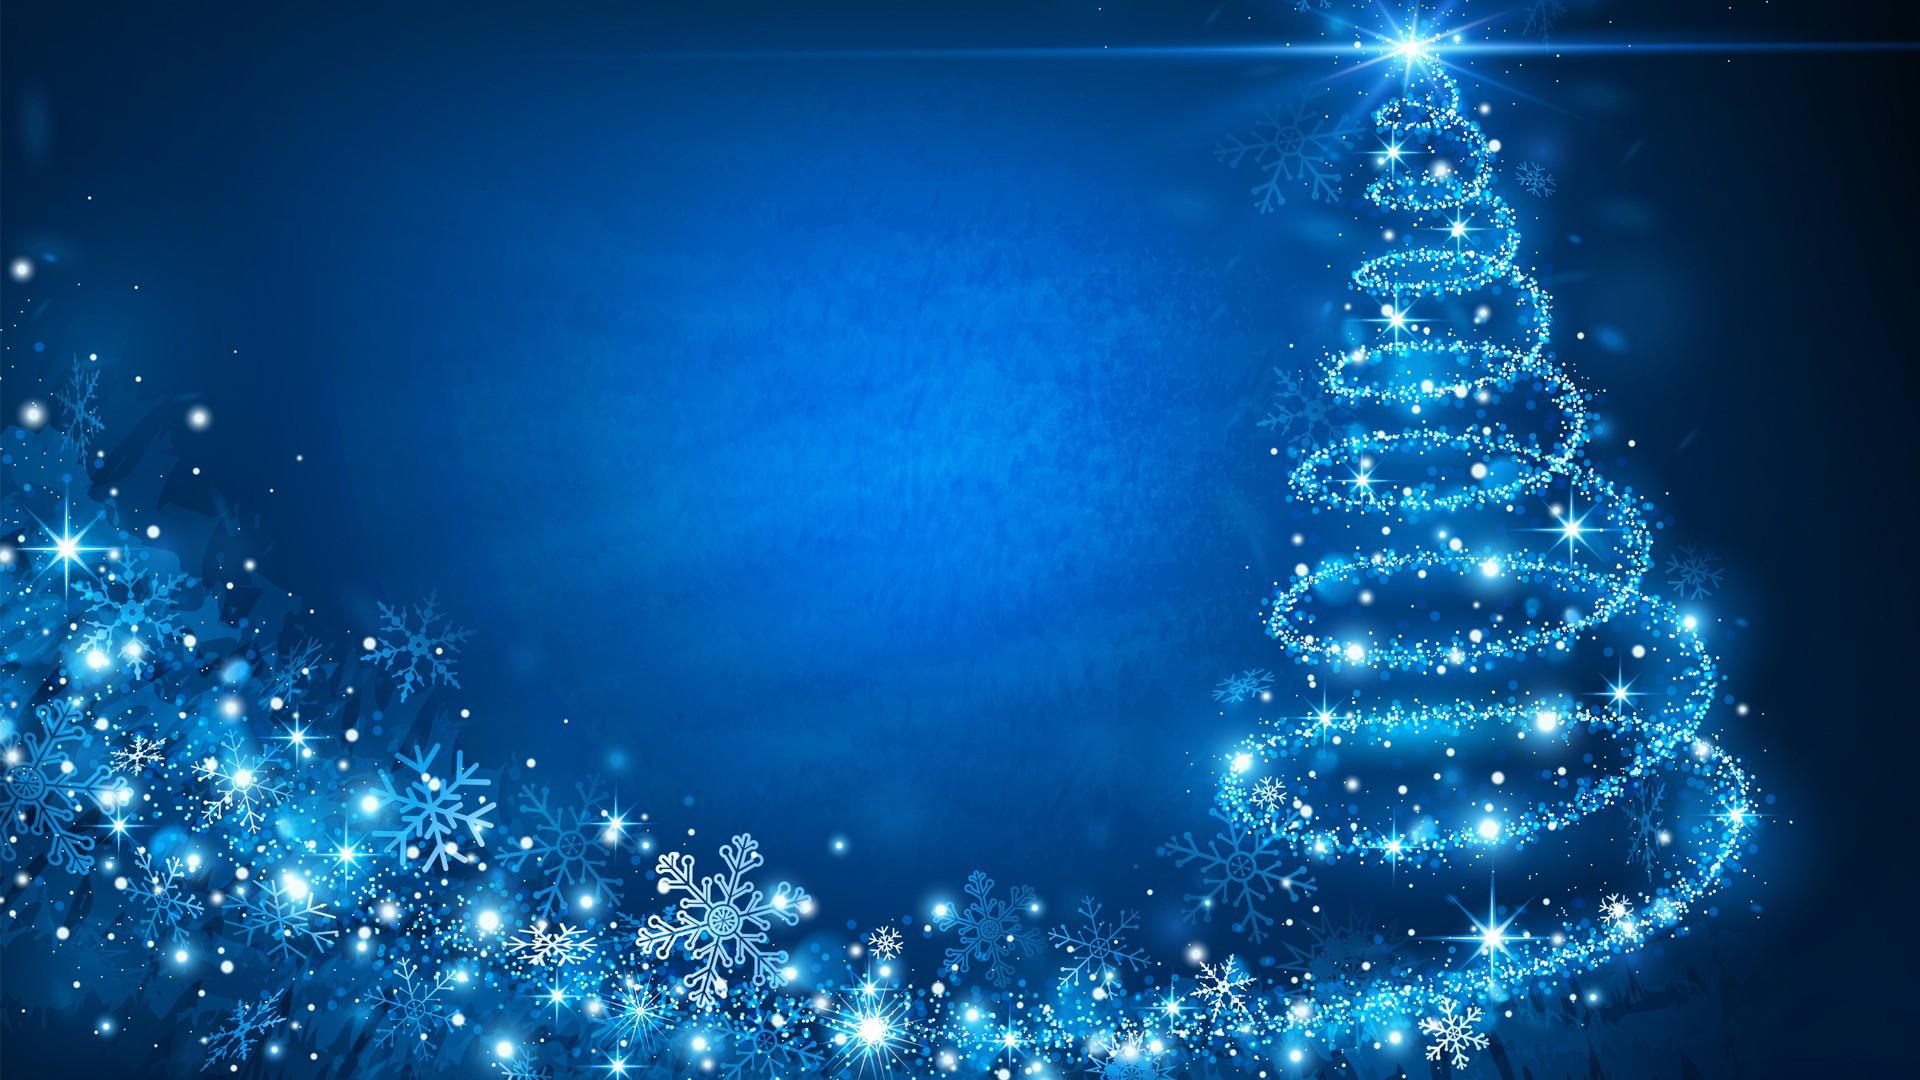 Free Download 77 Christmas Desktop Wallpapers On